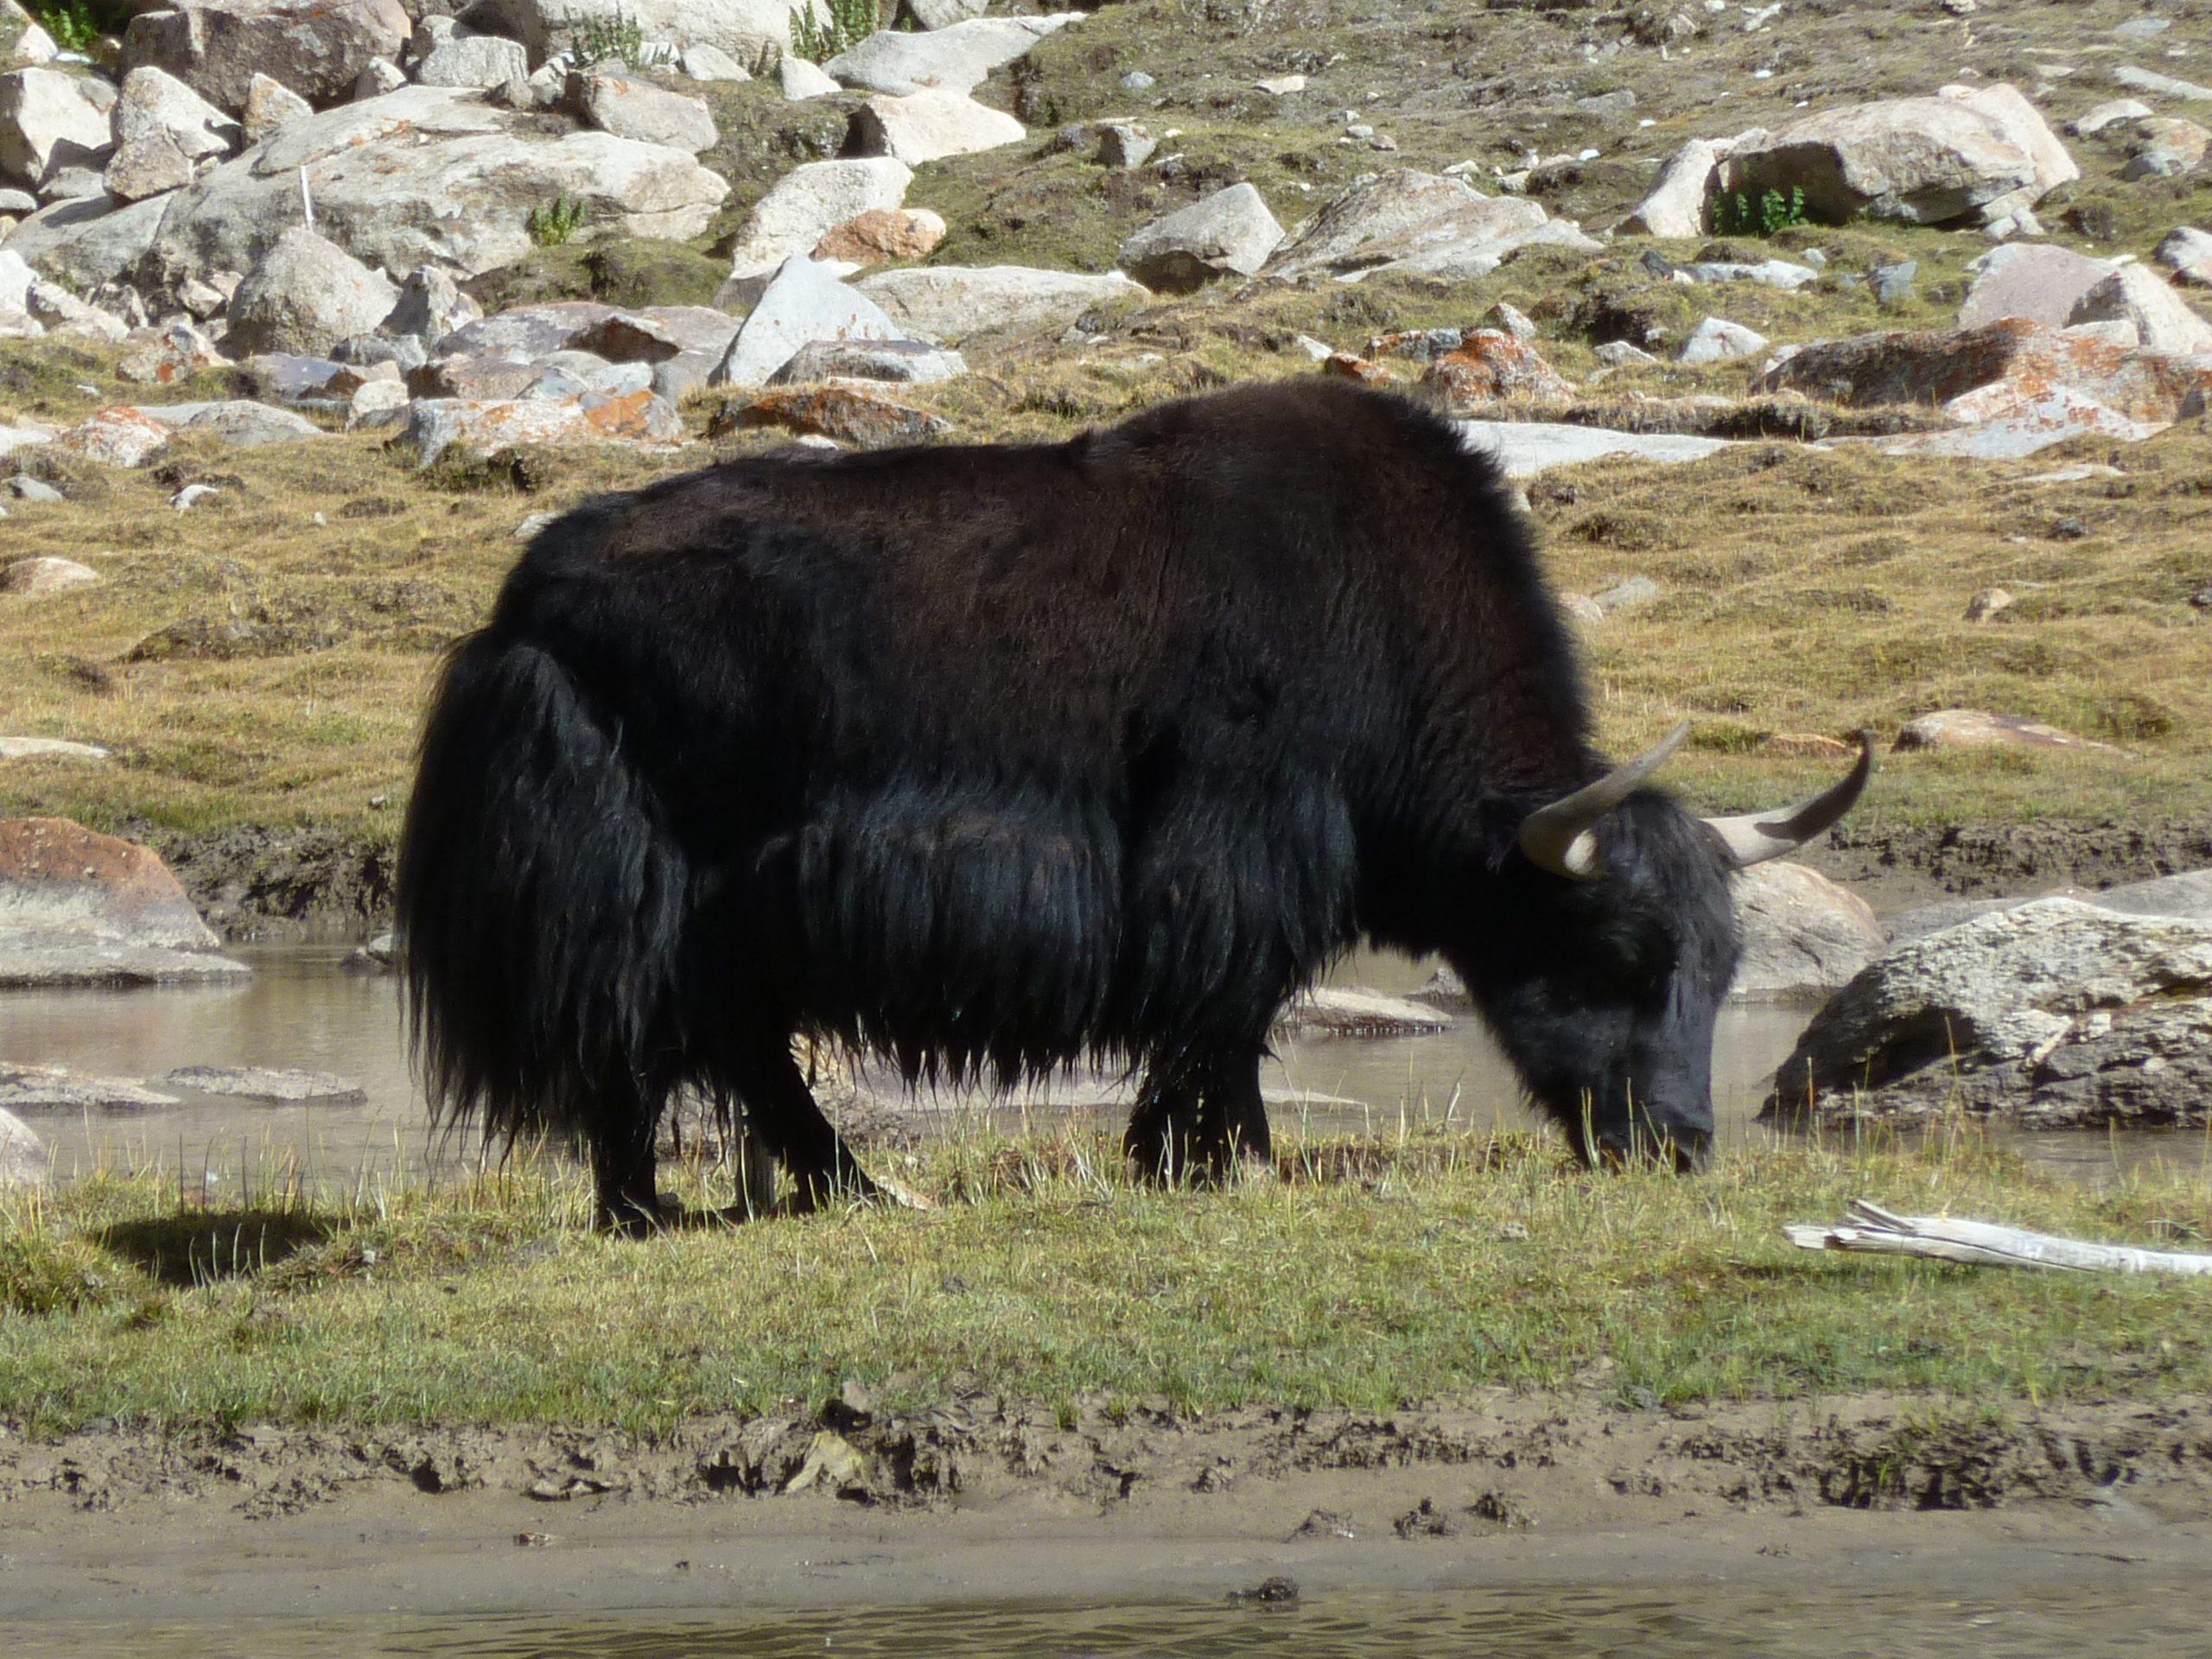 Radreise Ladakh 2012 - Yak am Tsolding Buddha Park